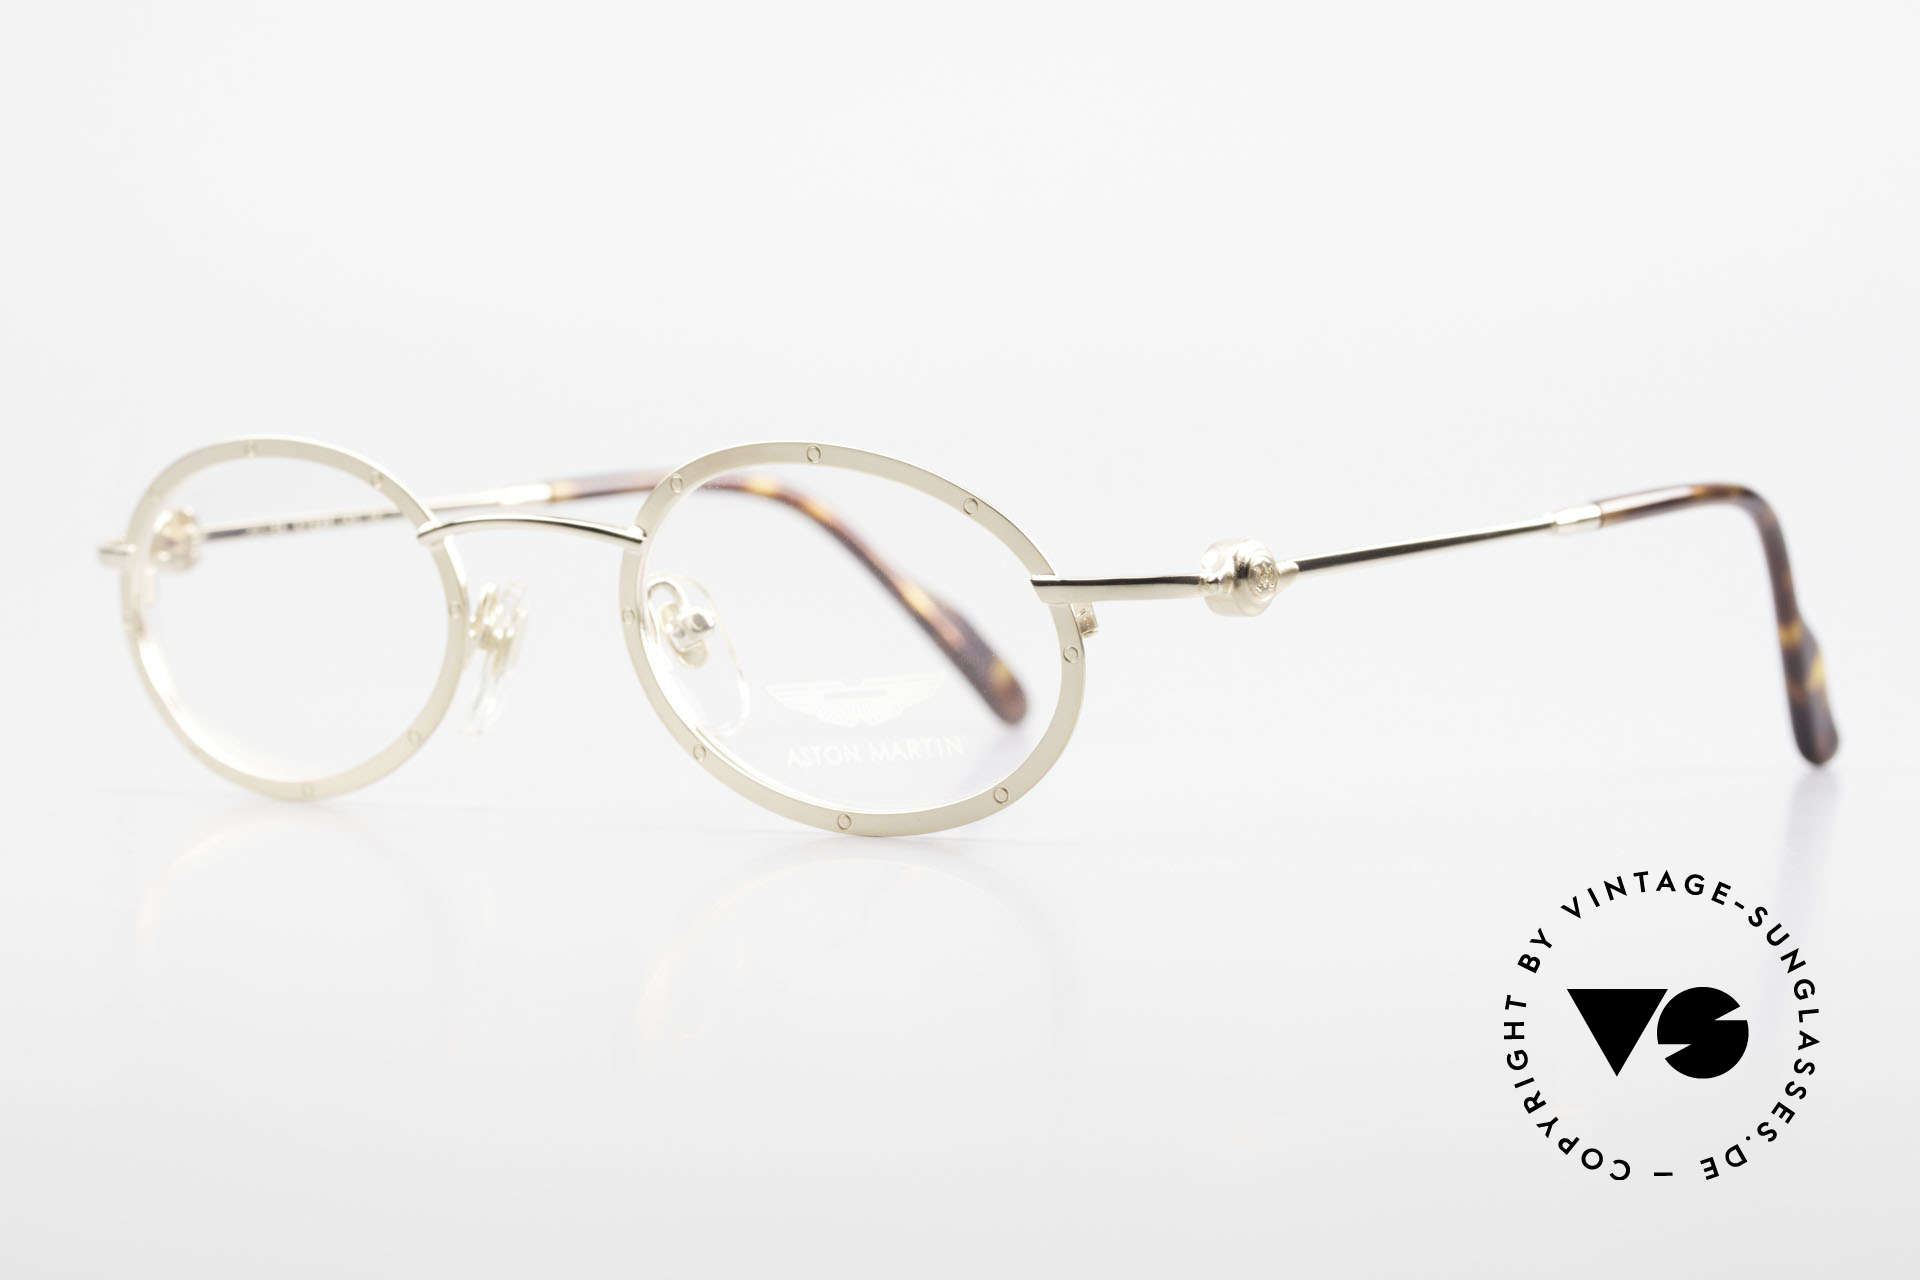 Aston Martin AM34 Oval James Bond Glasses 007, sporty and elegant classic: James Bond 'gentlemen style', Made for Men